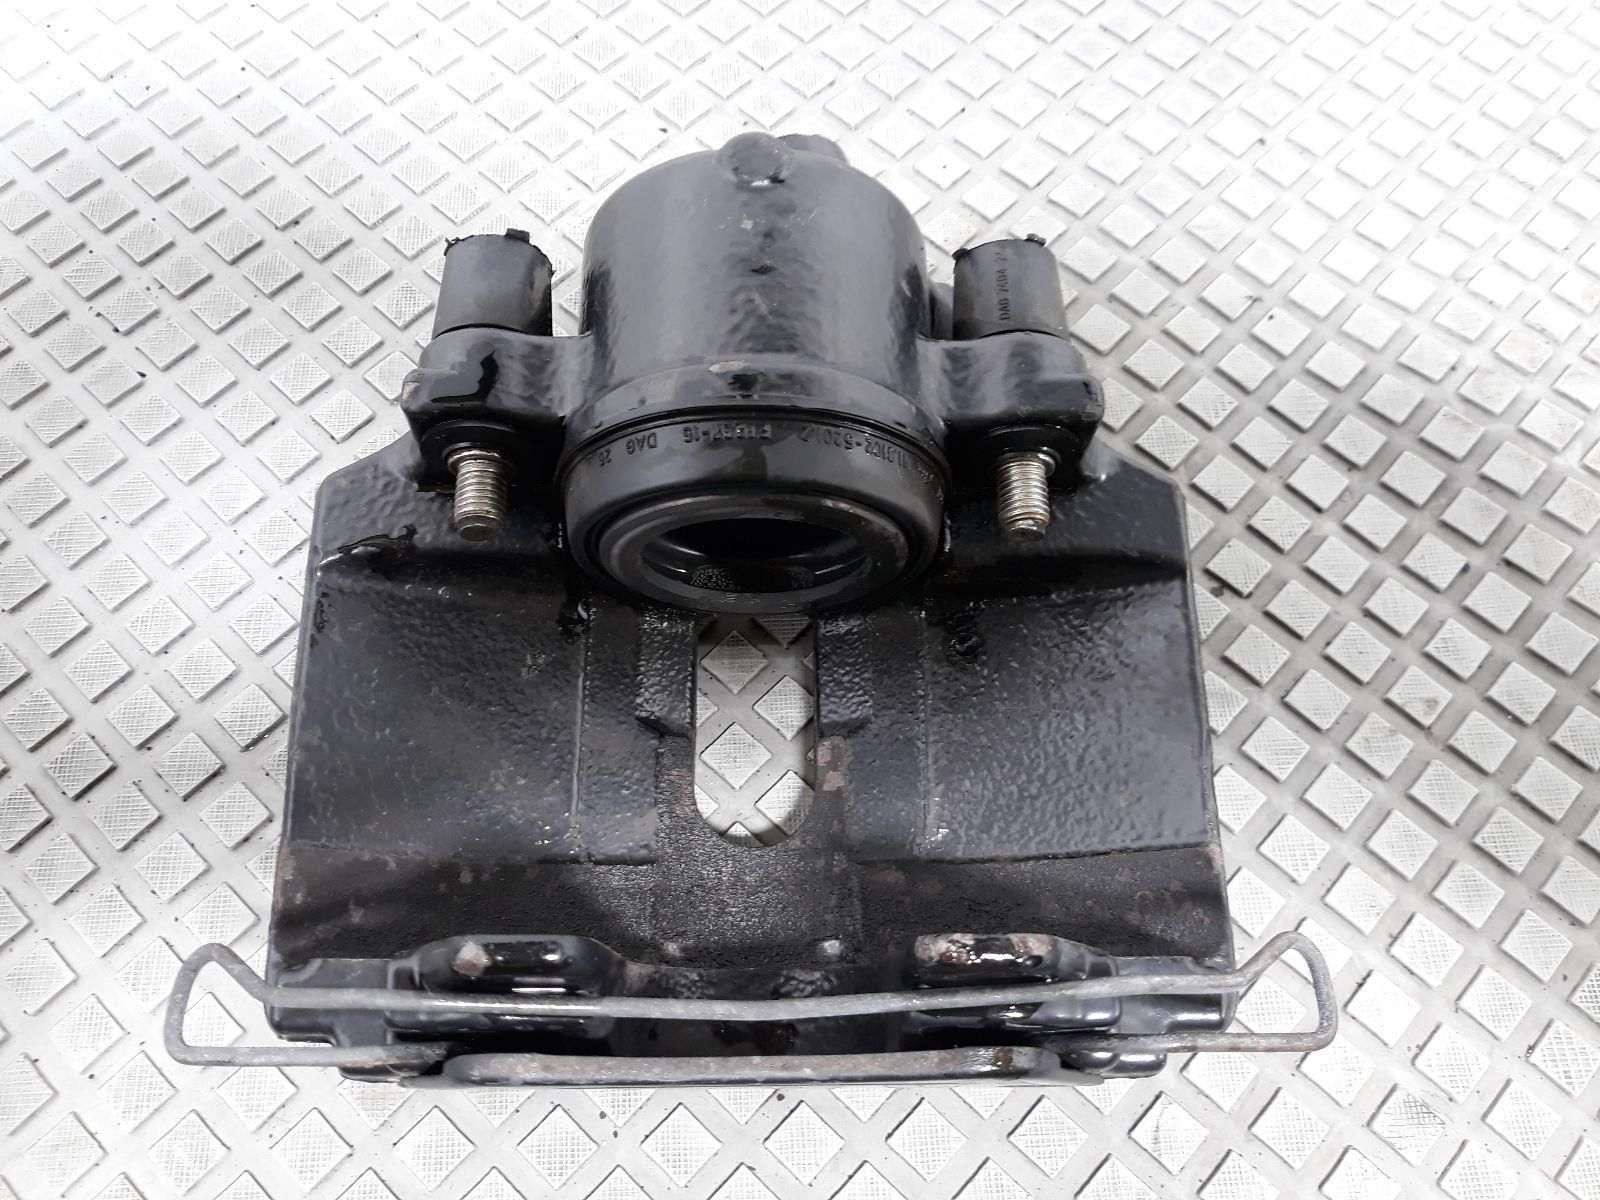 2014 audi a1 2014 on s1 tfsi quattro manual petrol for Garage audi 93 livry gargan